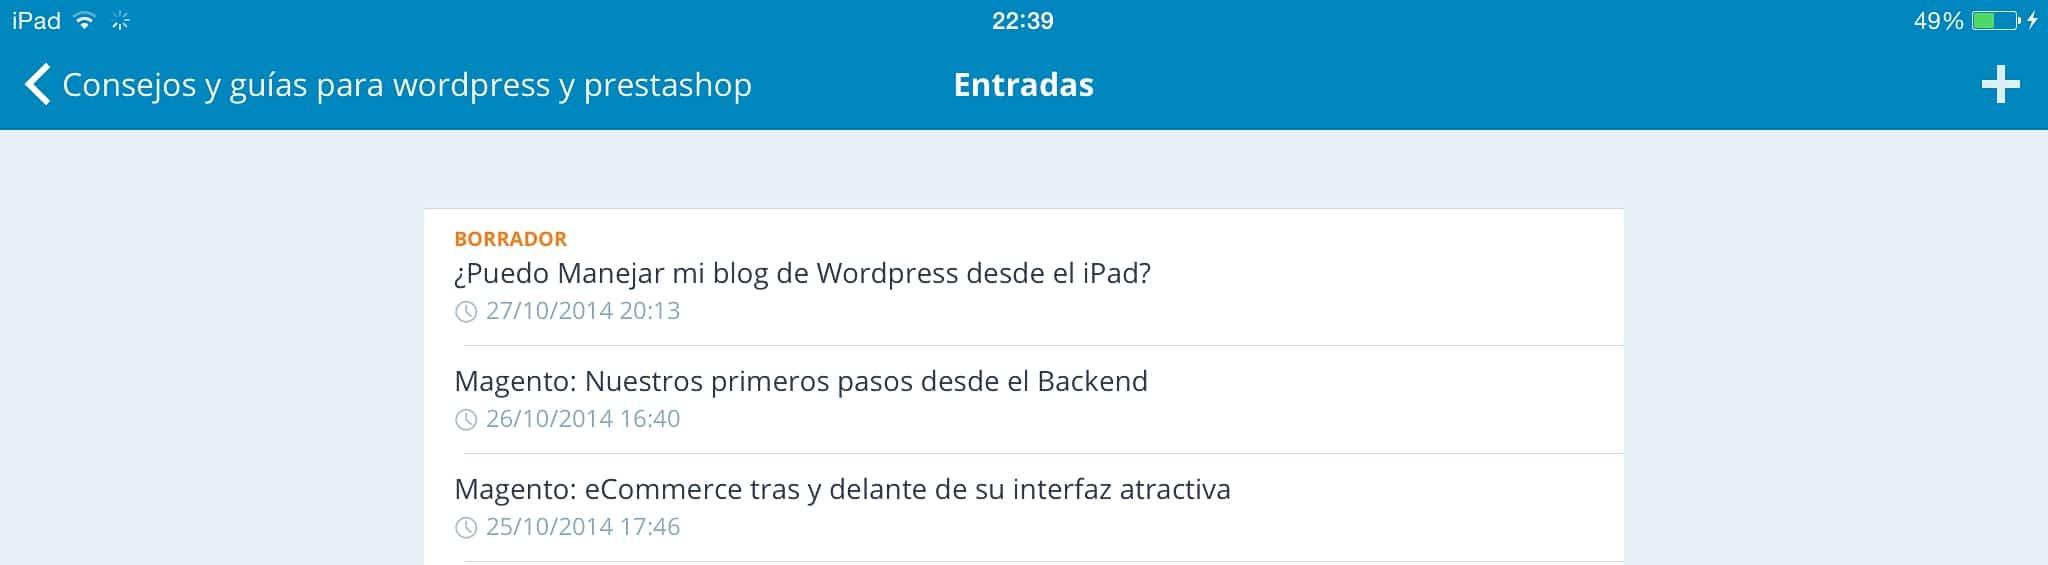 Wordpress en el iPad 18